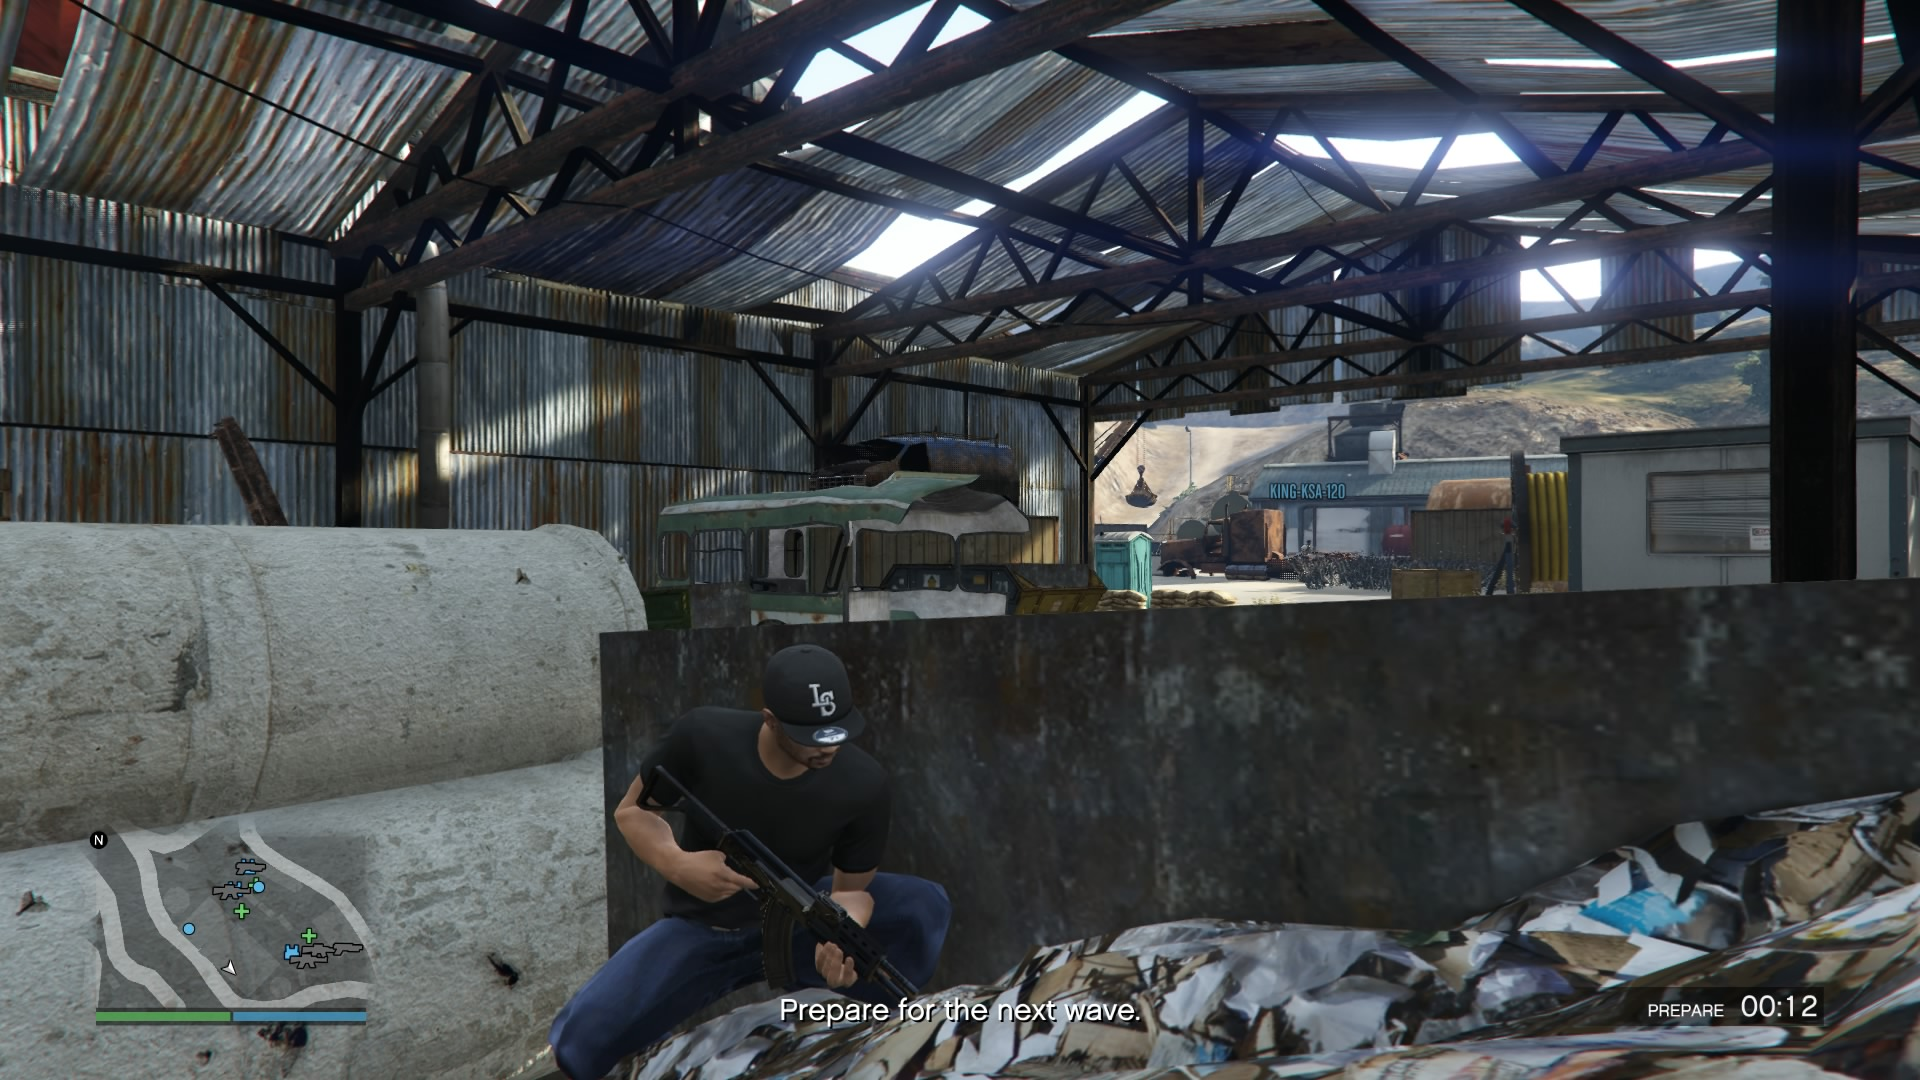 My online character holding an assault rifle.